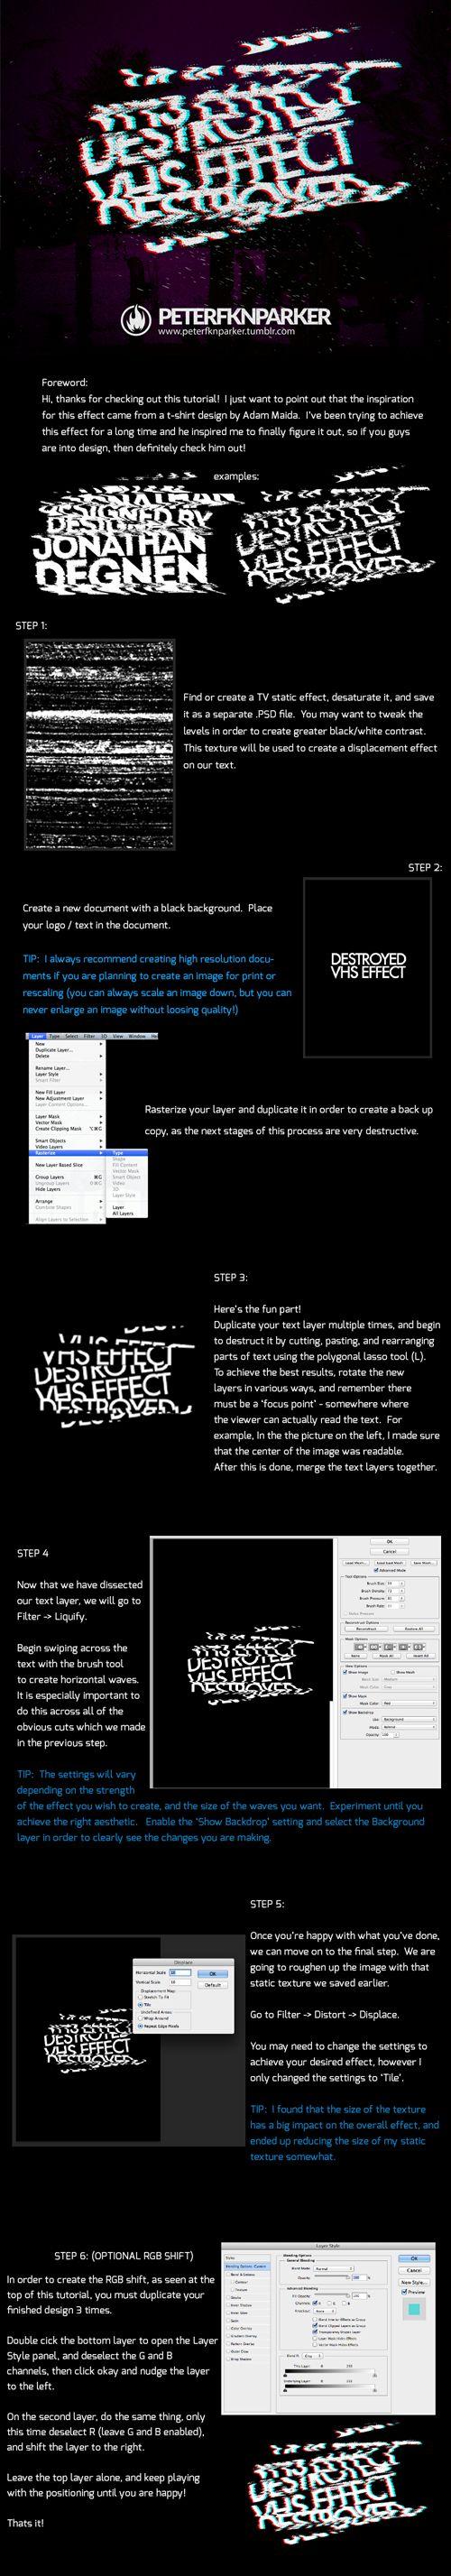 DESTROYED VHS EFFECT - Photoshop Tutorial by PETERFKNPARKER.deviantart.com on @deviantART